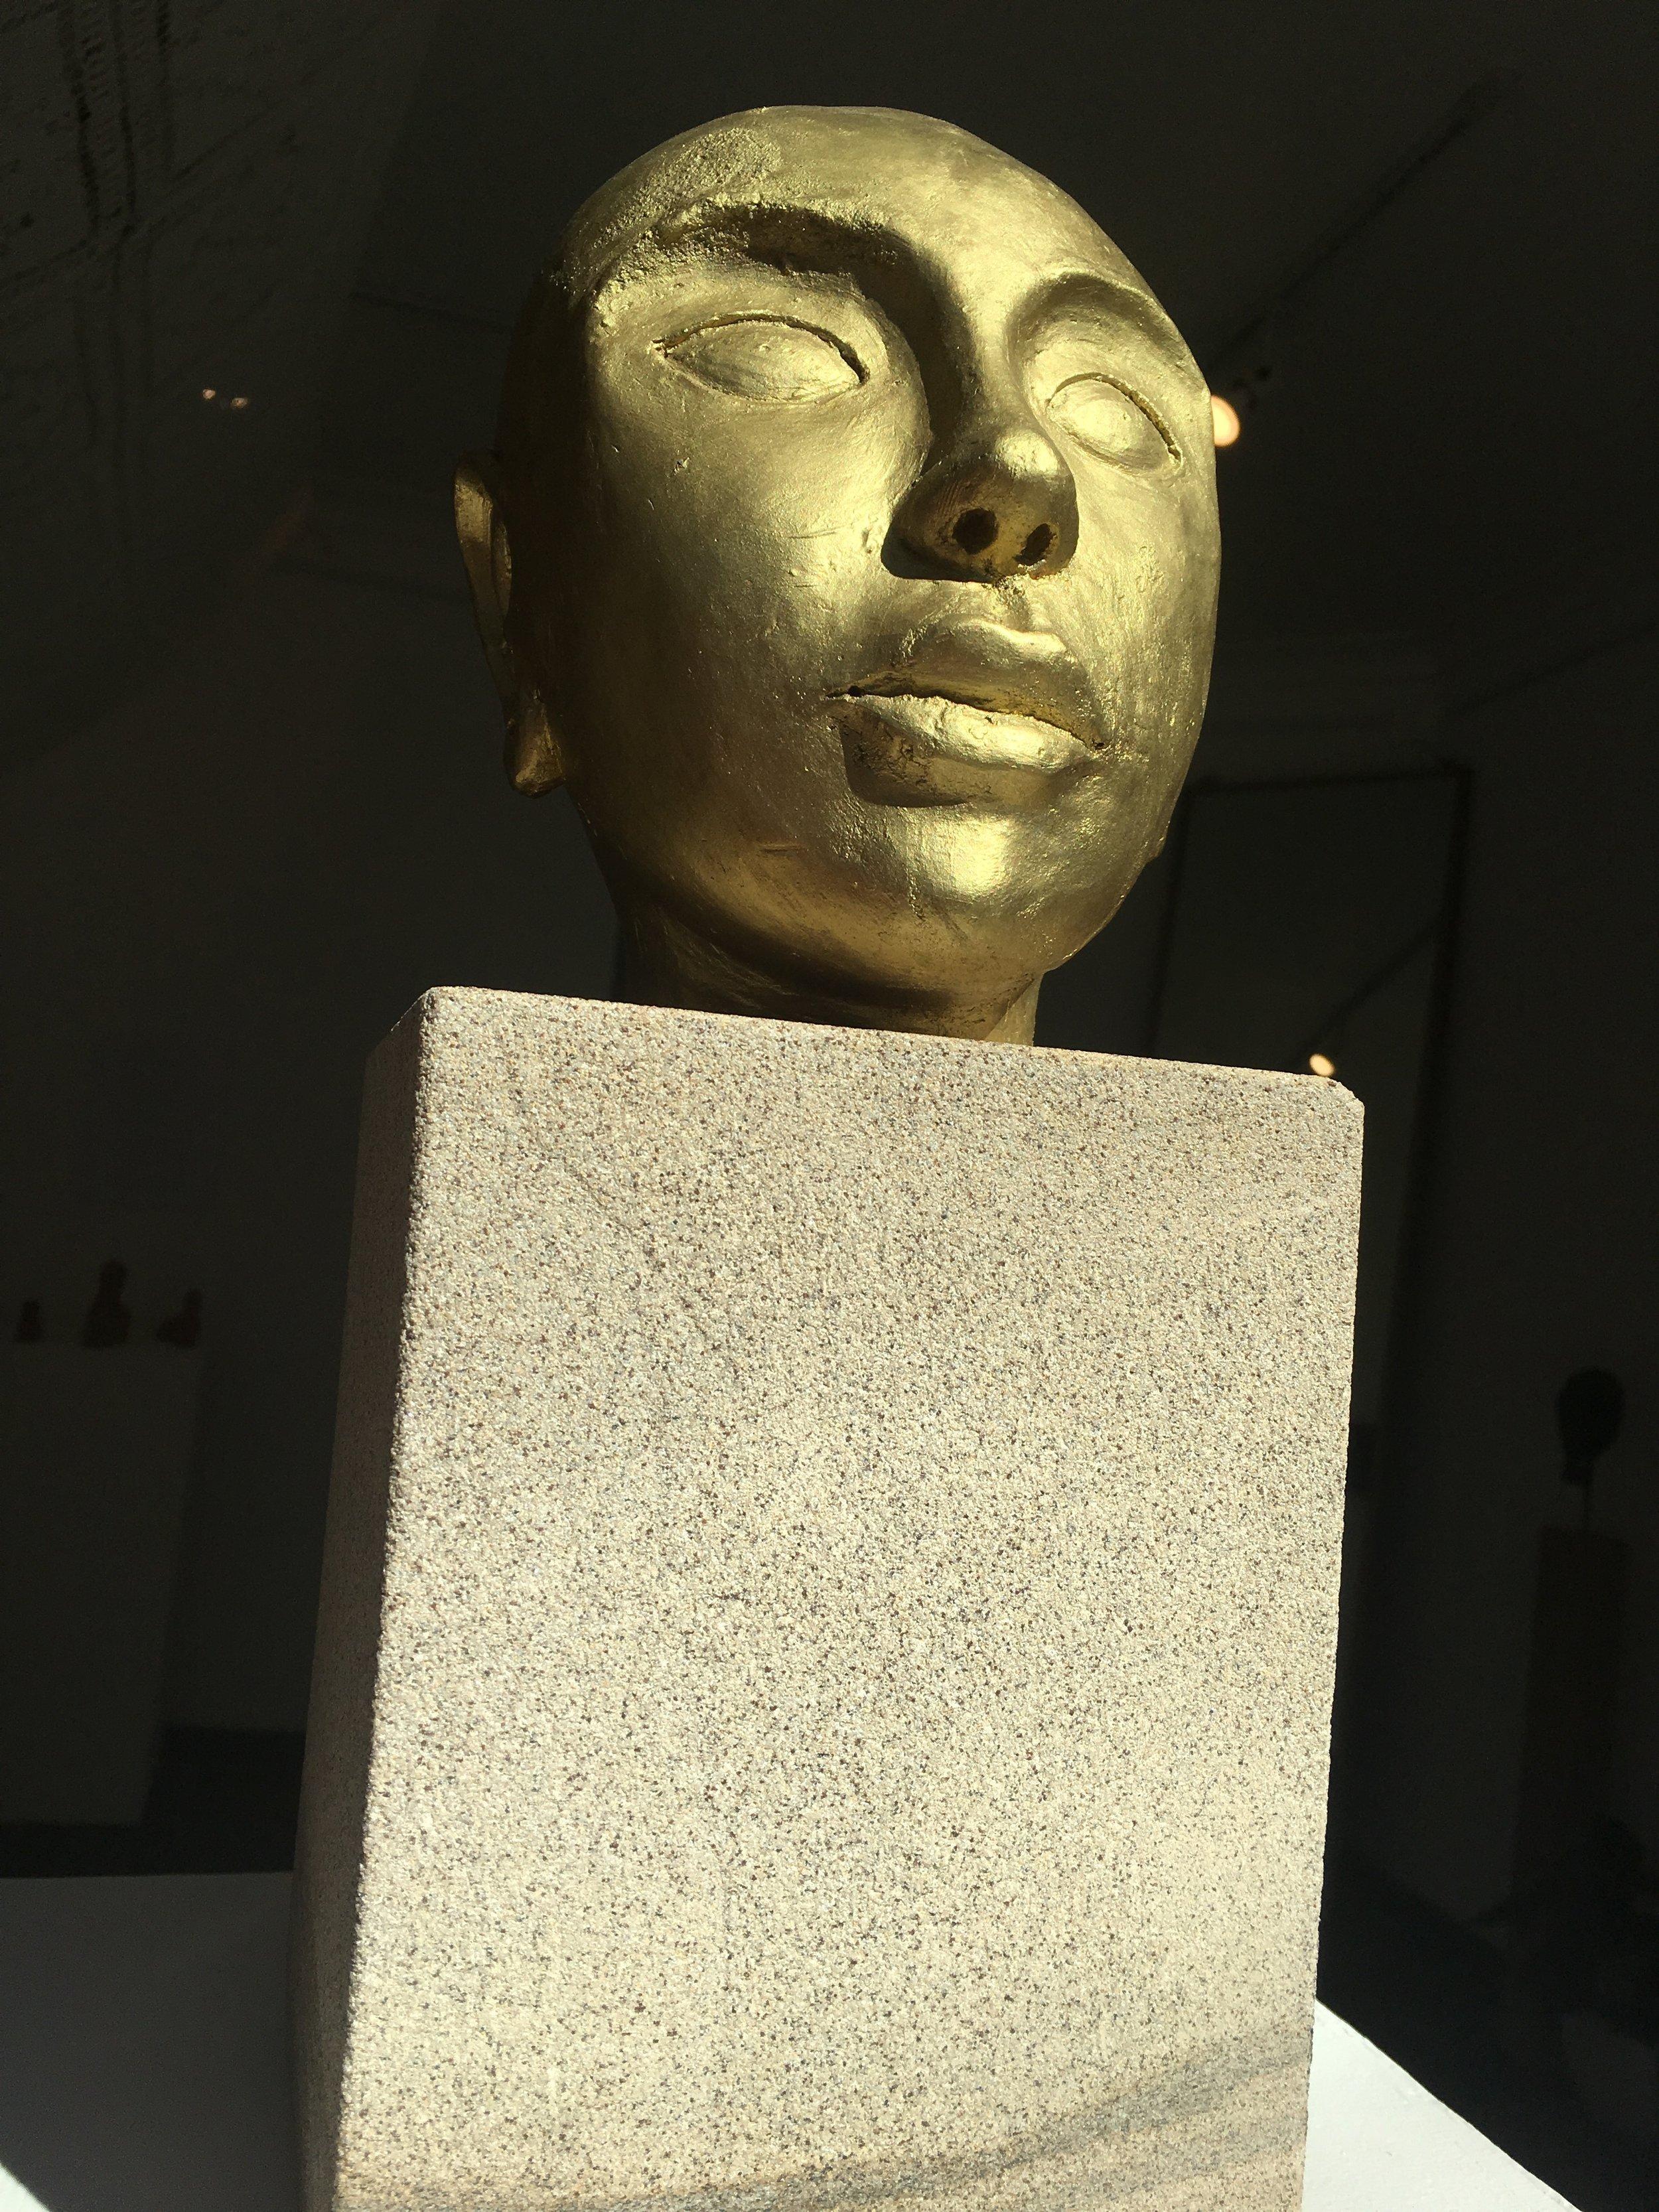 Mestiço, ceramic, sandstone, Atelier Jotace, Lençois, Minas Gerais, $ 720.00